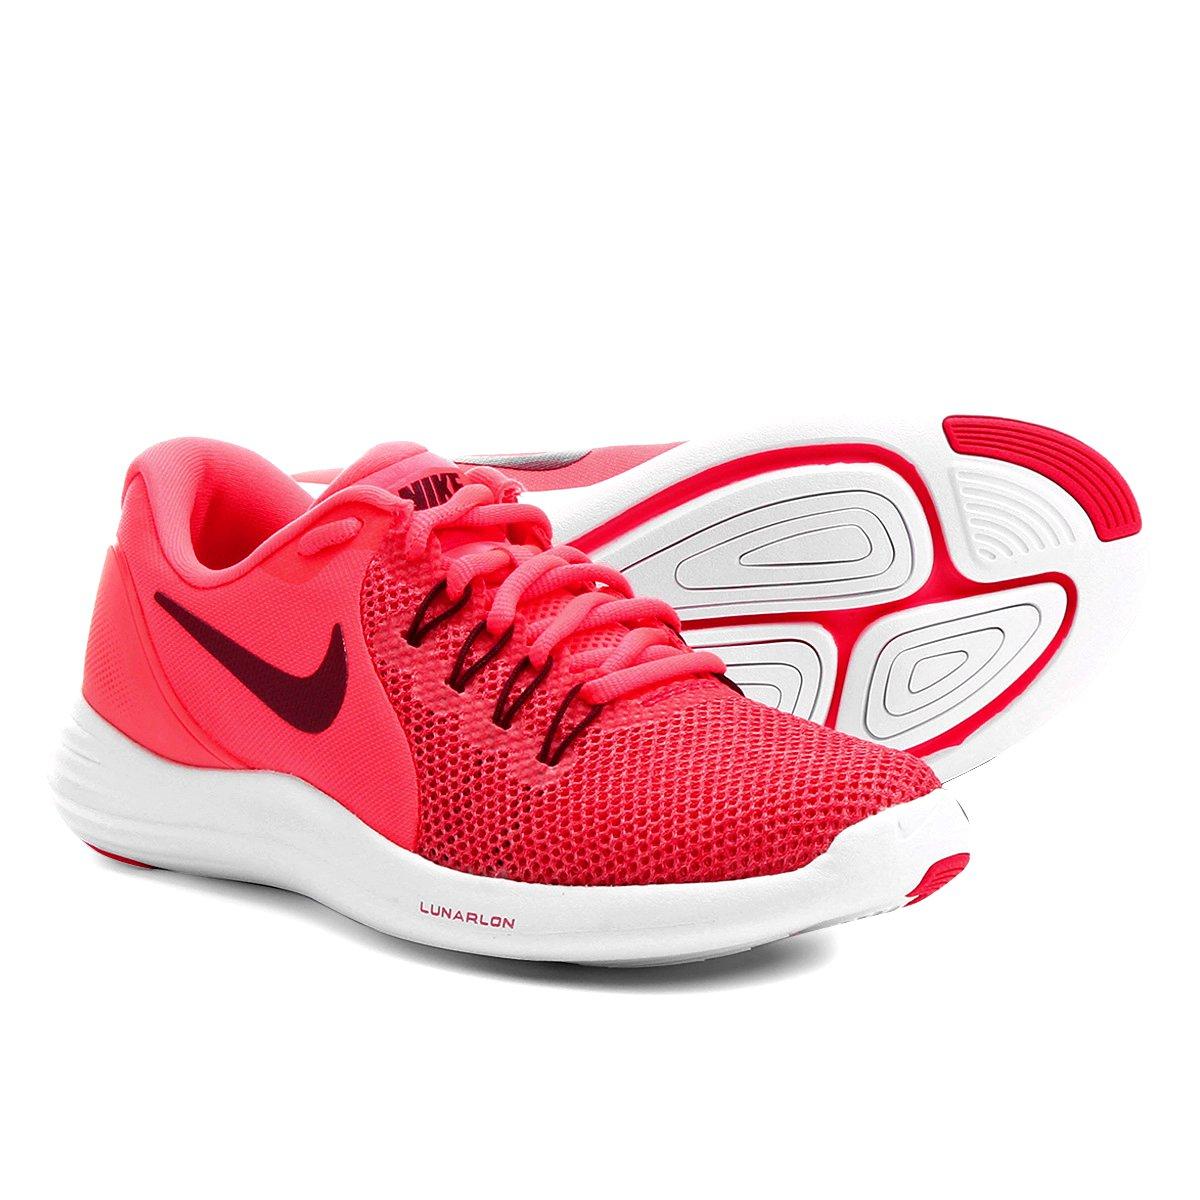 035c9d448b692 Tênis Nike Lunar Apparent Feminino - Pink